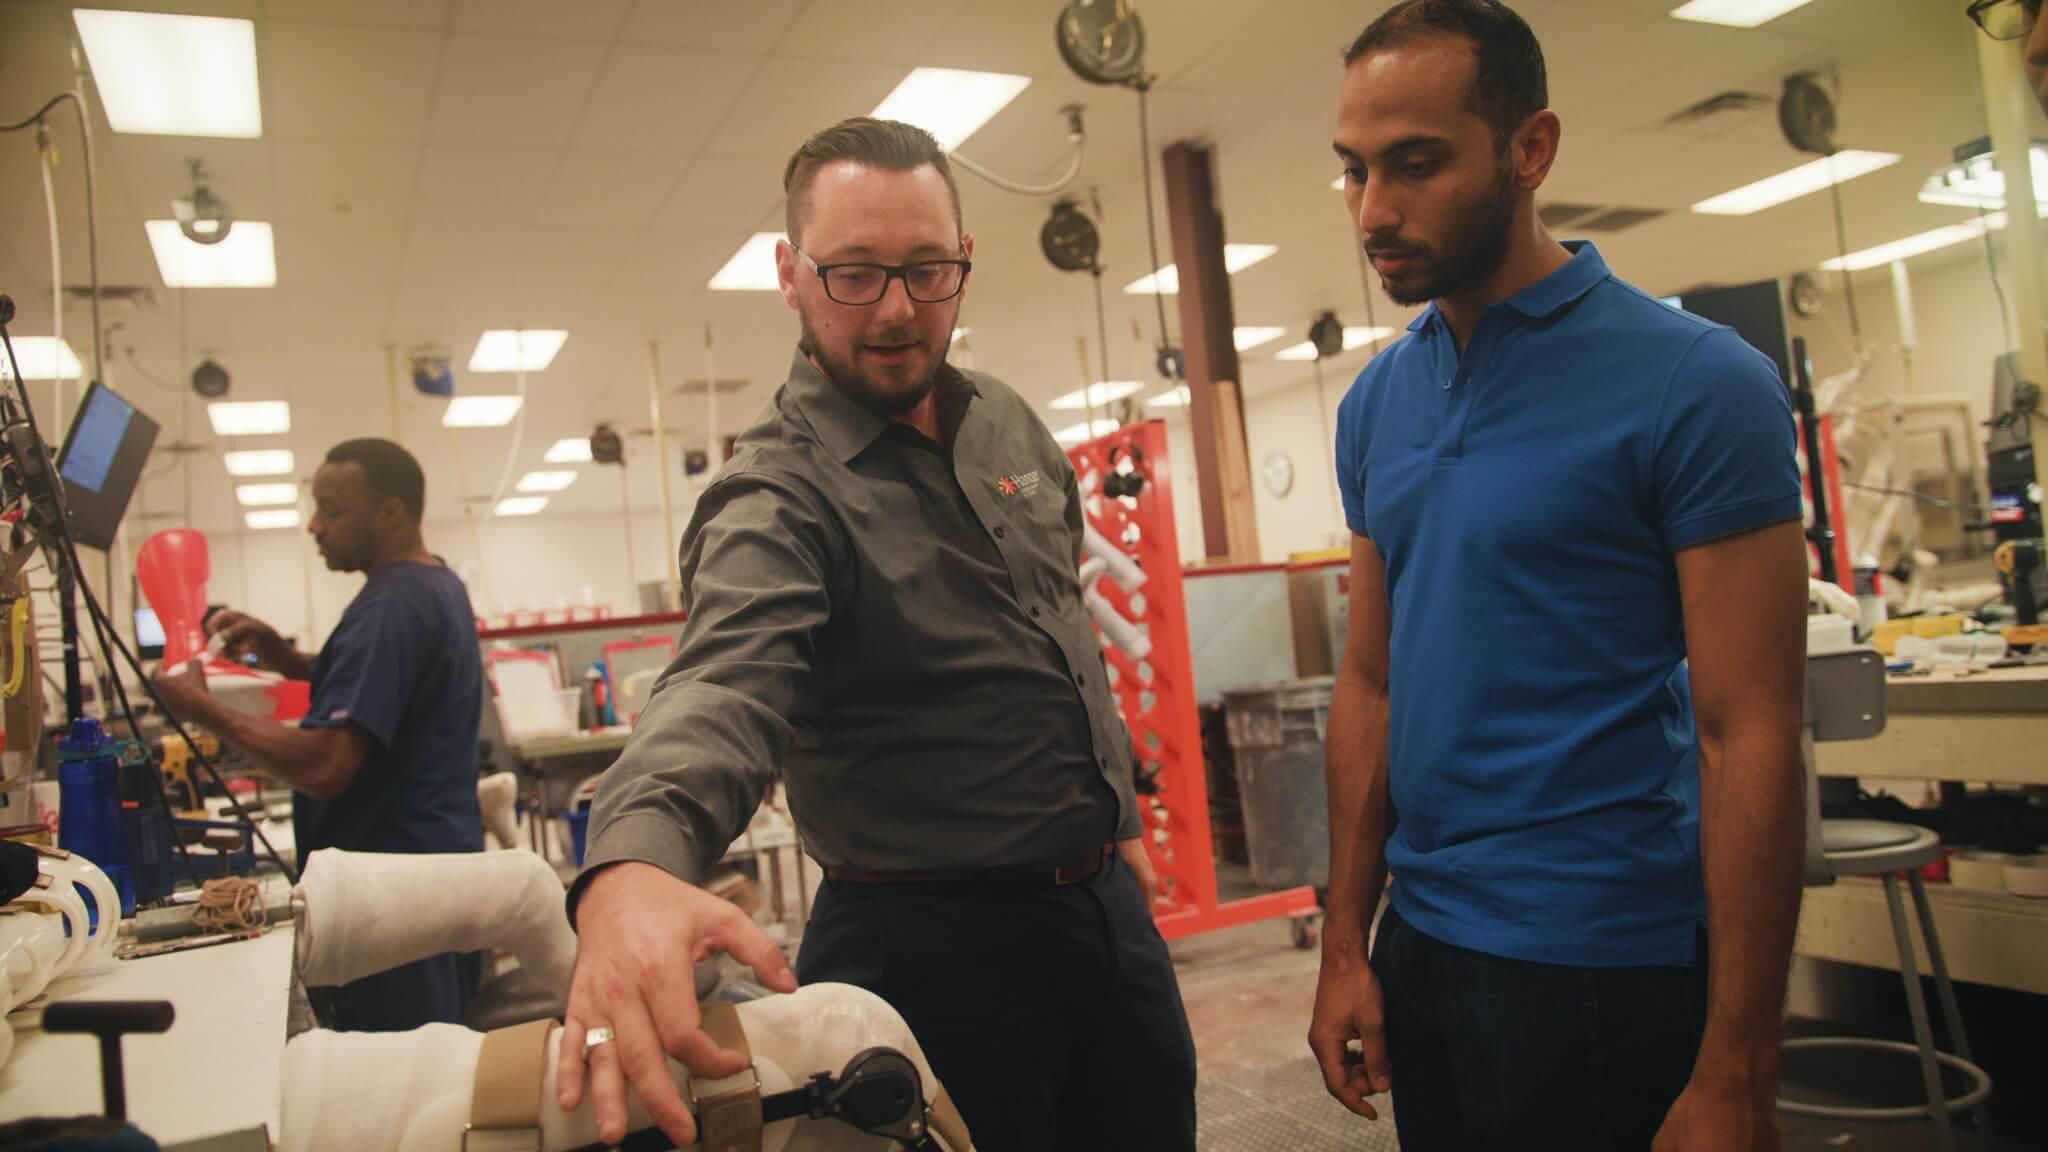 AT&T Foundry, Hanger, prosthetic